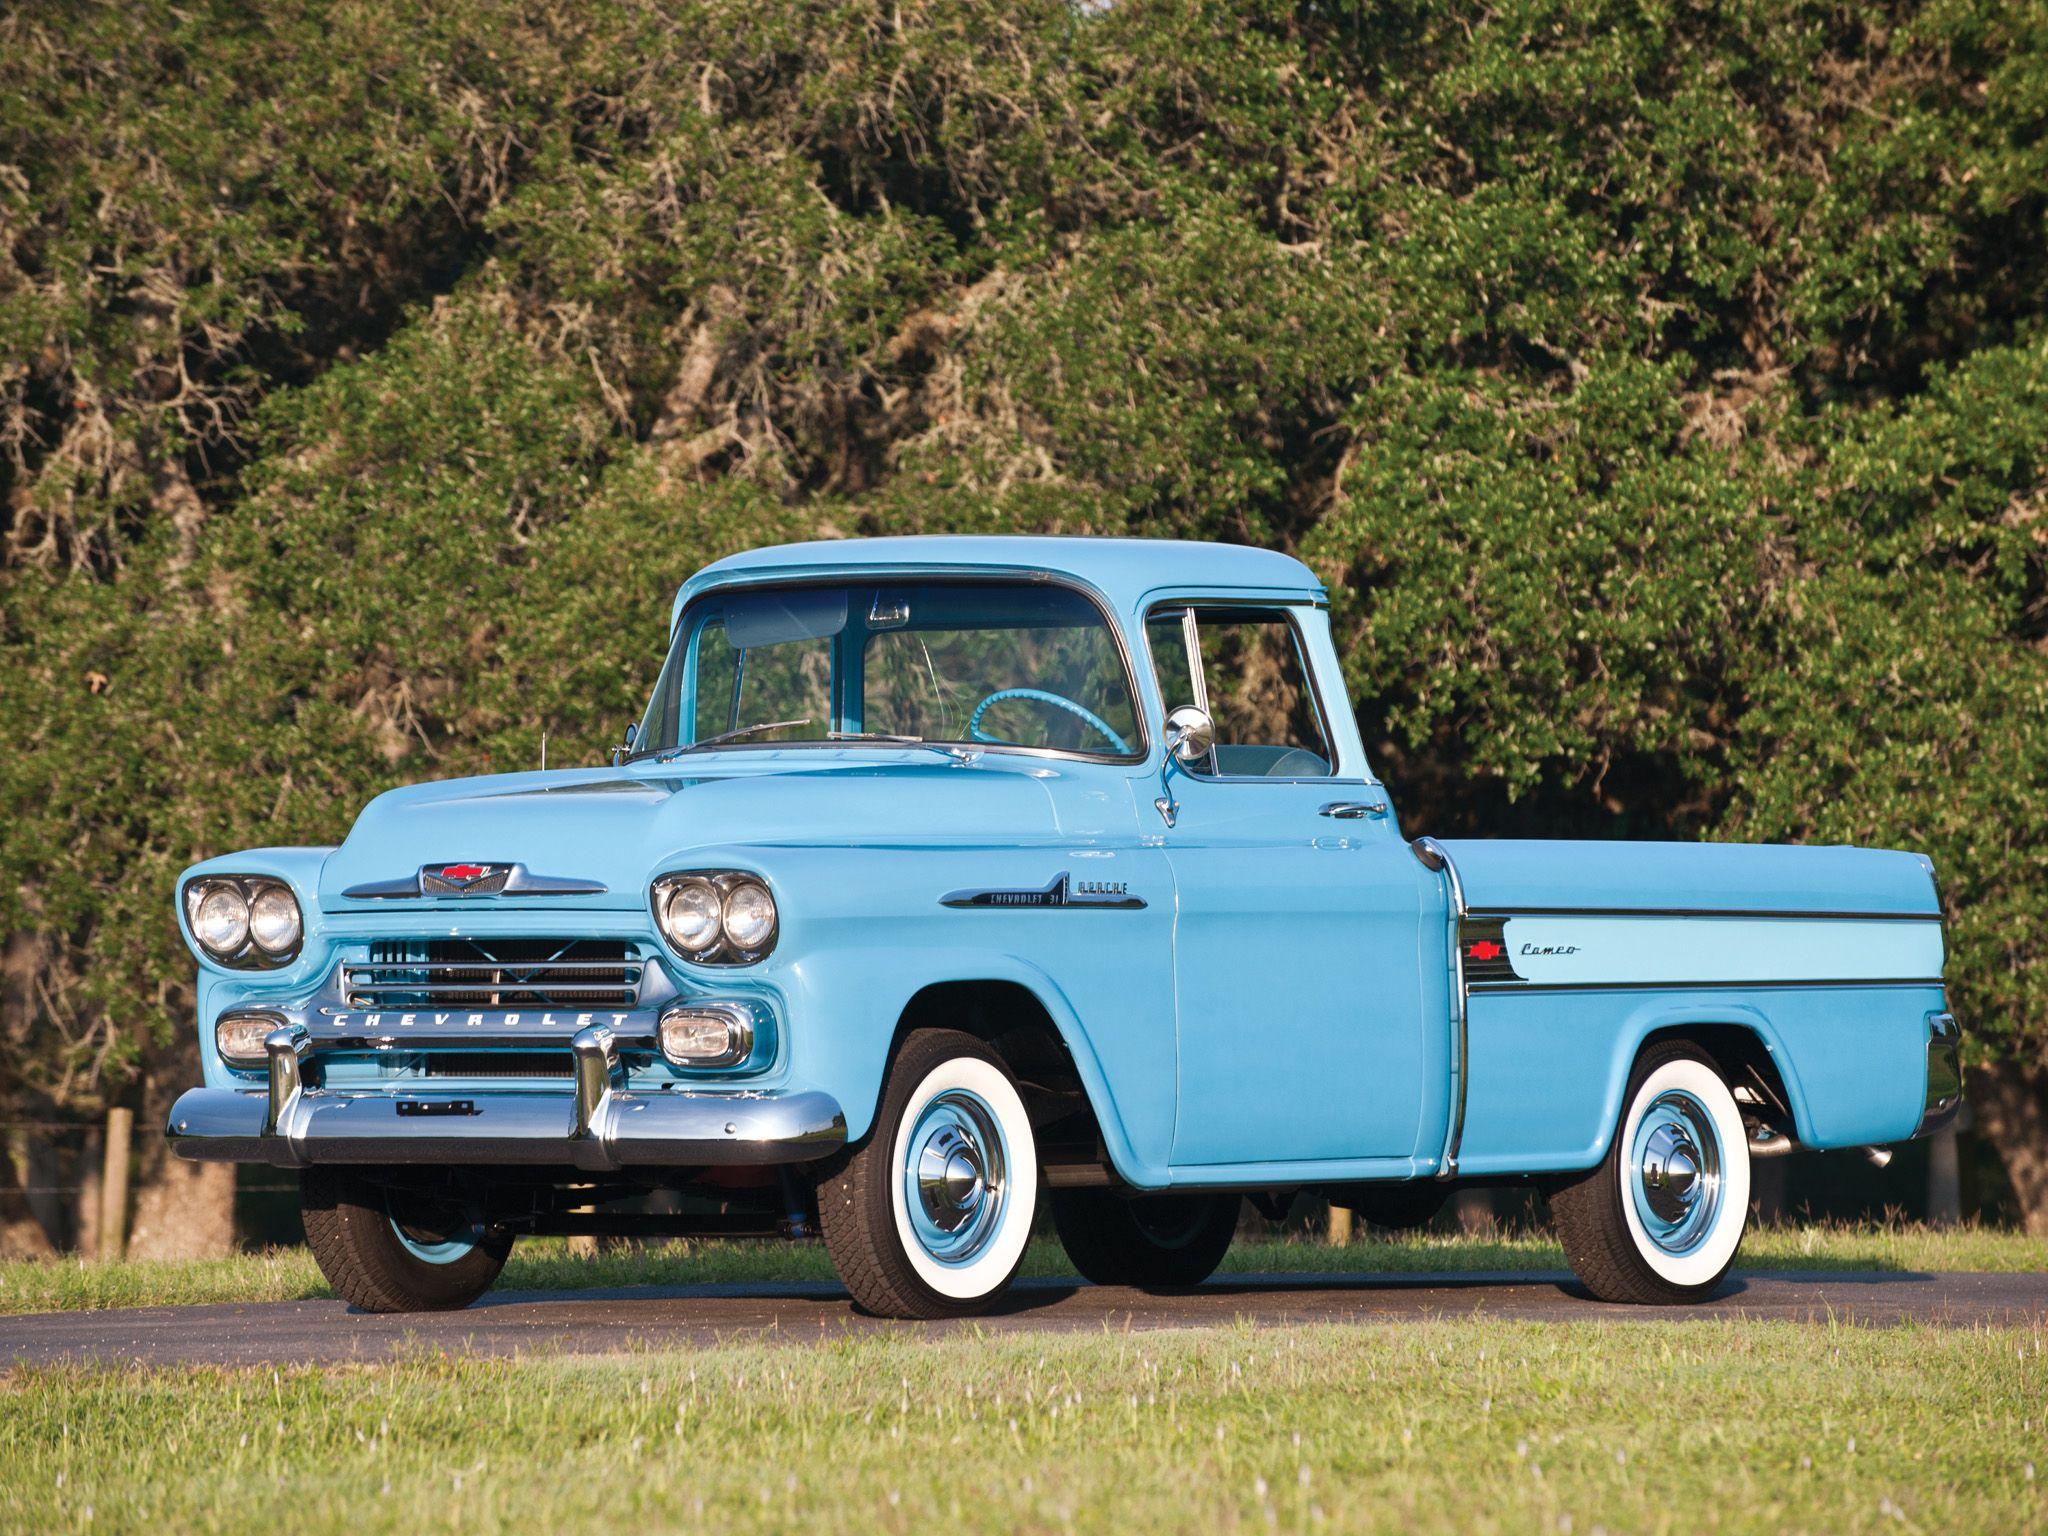 Chevrolet Apache 31 Cameo Fleetside 1958 Wallpaper 239 Old Pickup Trucks Classic Cars Trucks Pickup Trucks